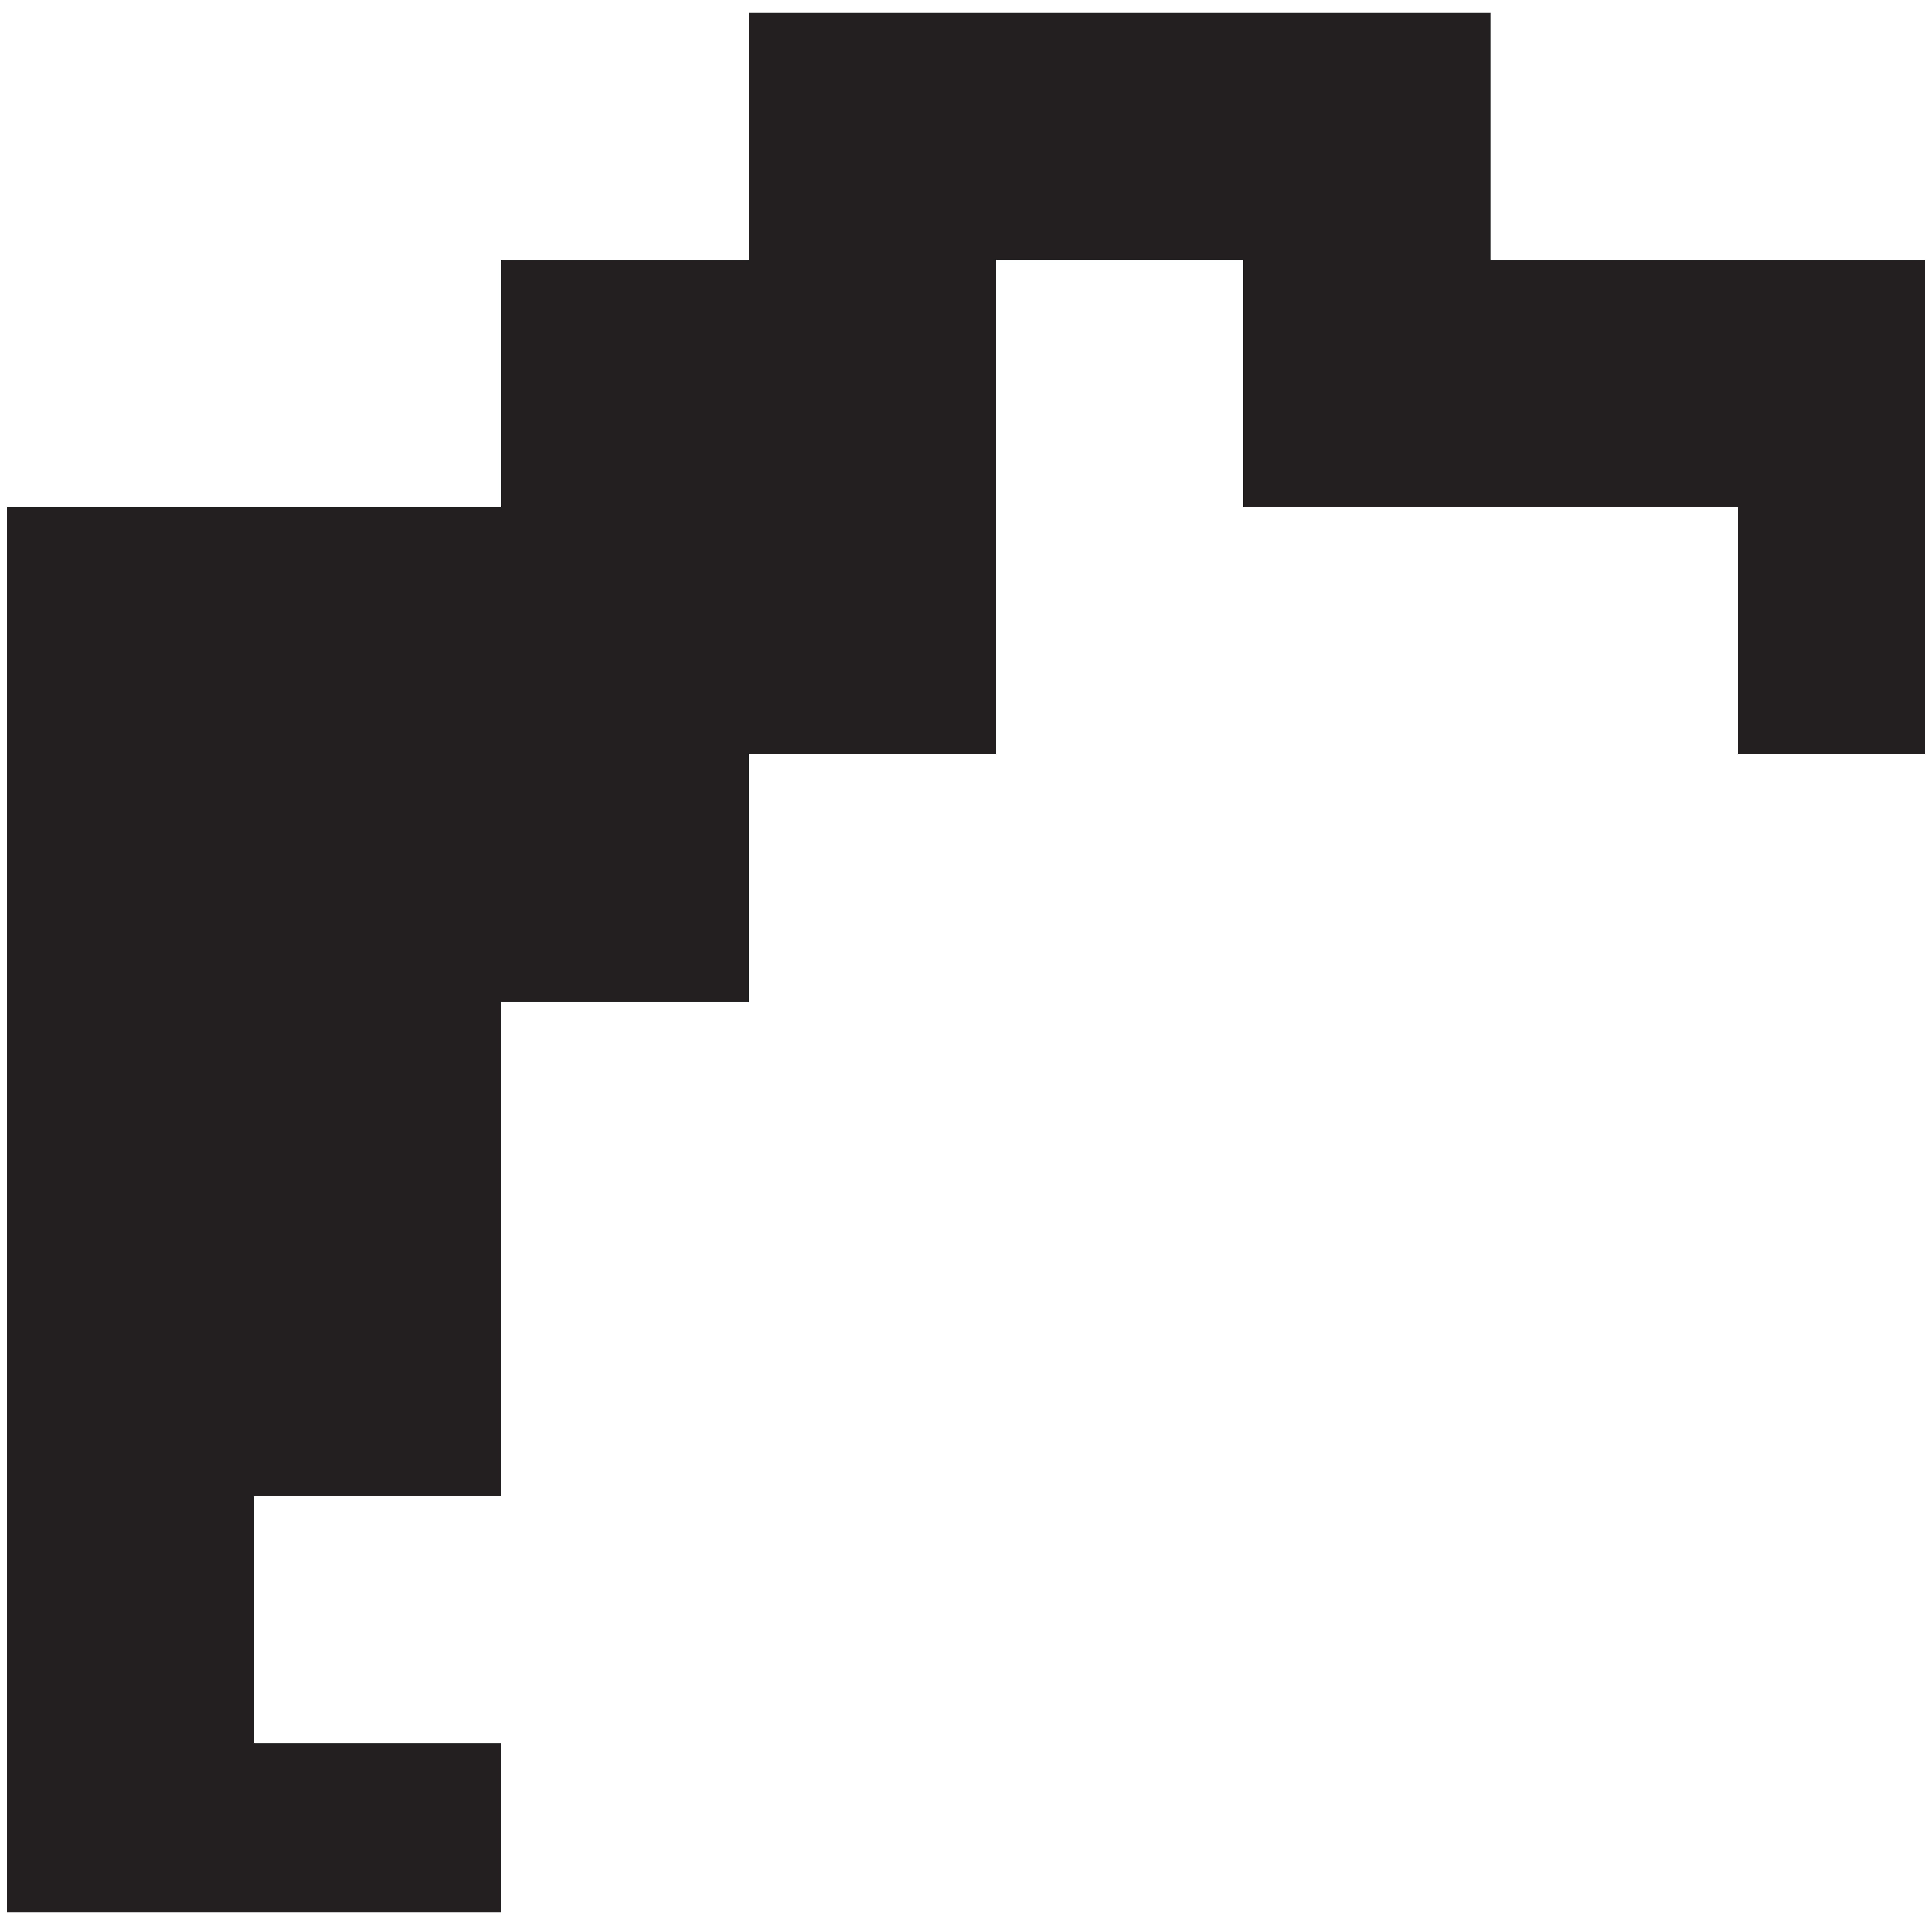 Fisherman clipart silhouette #13